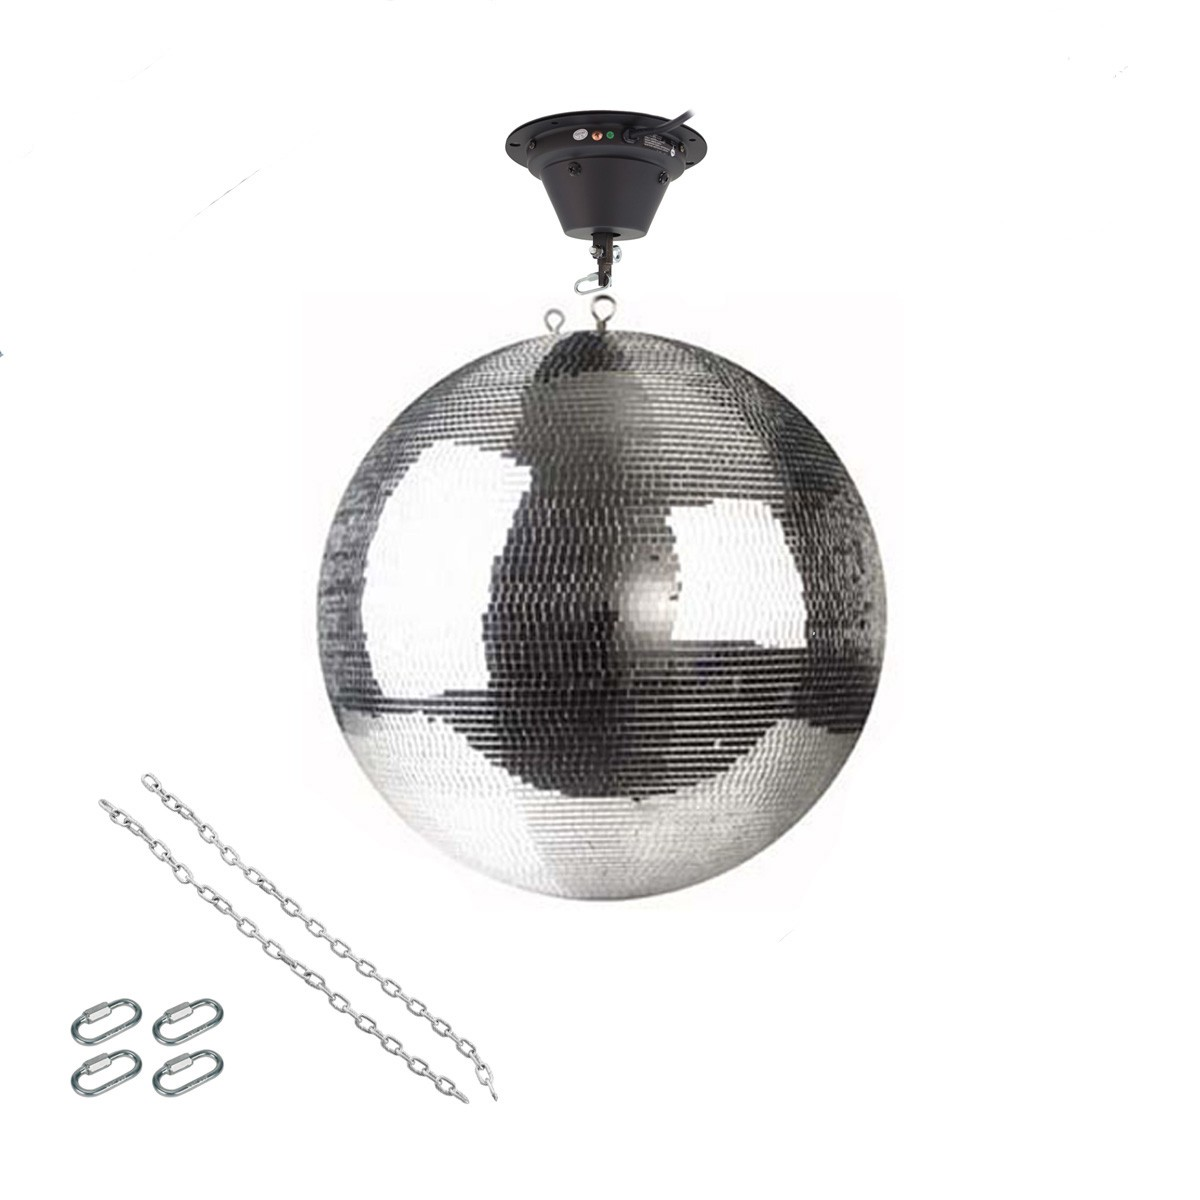 Spiegelkugel Set 50cm Kugel PREMIUM + Motor MBM-5010, 2 Ketten, 4 Kettenglieder